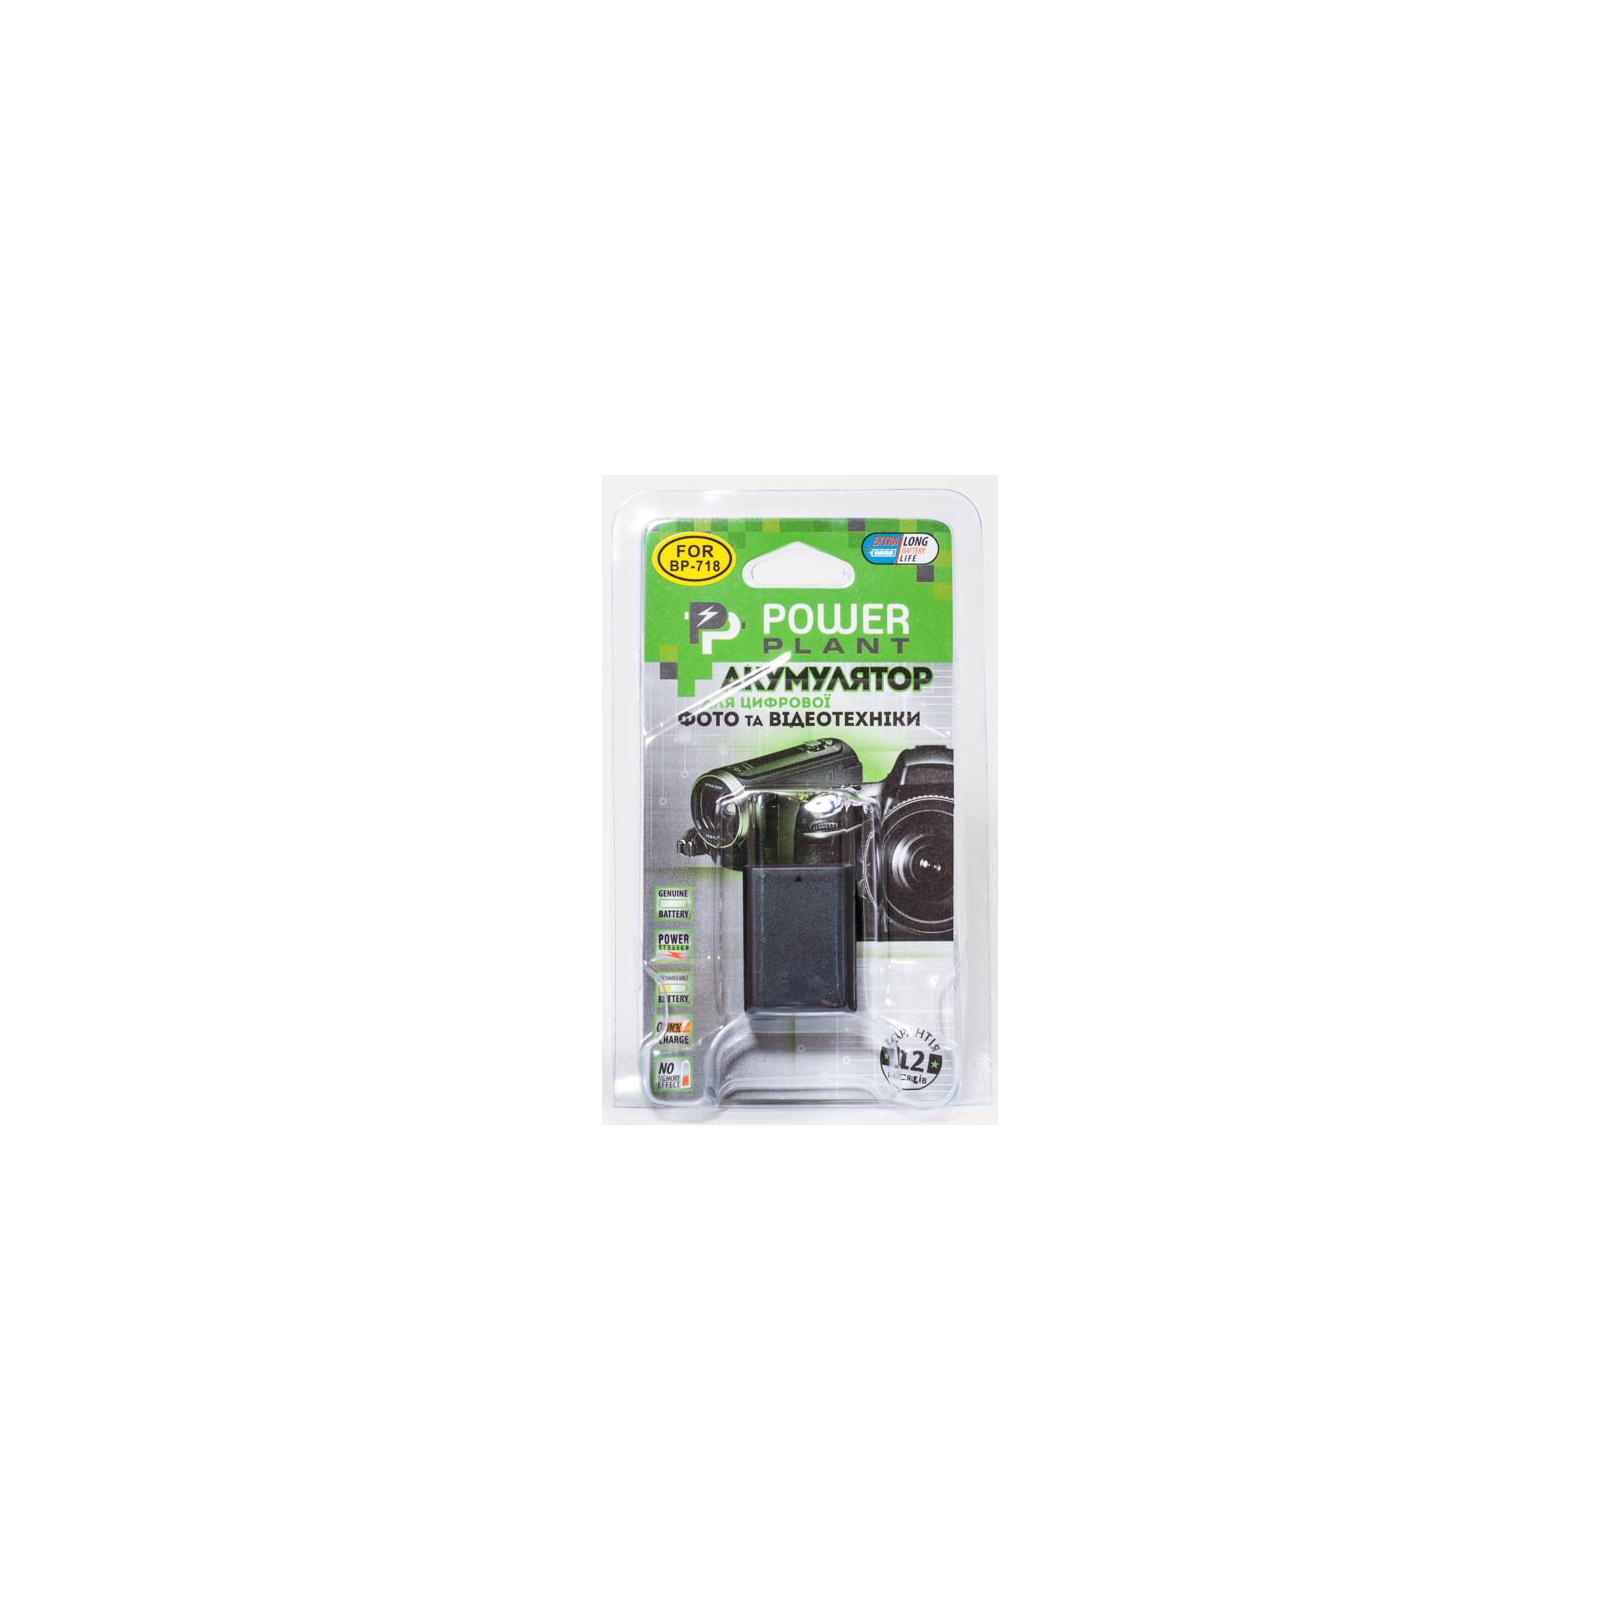 Аккумулятор к фото/видео PowerPlant Canon BP-718 chip (DV00DV1385) изображение 3